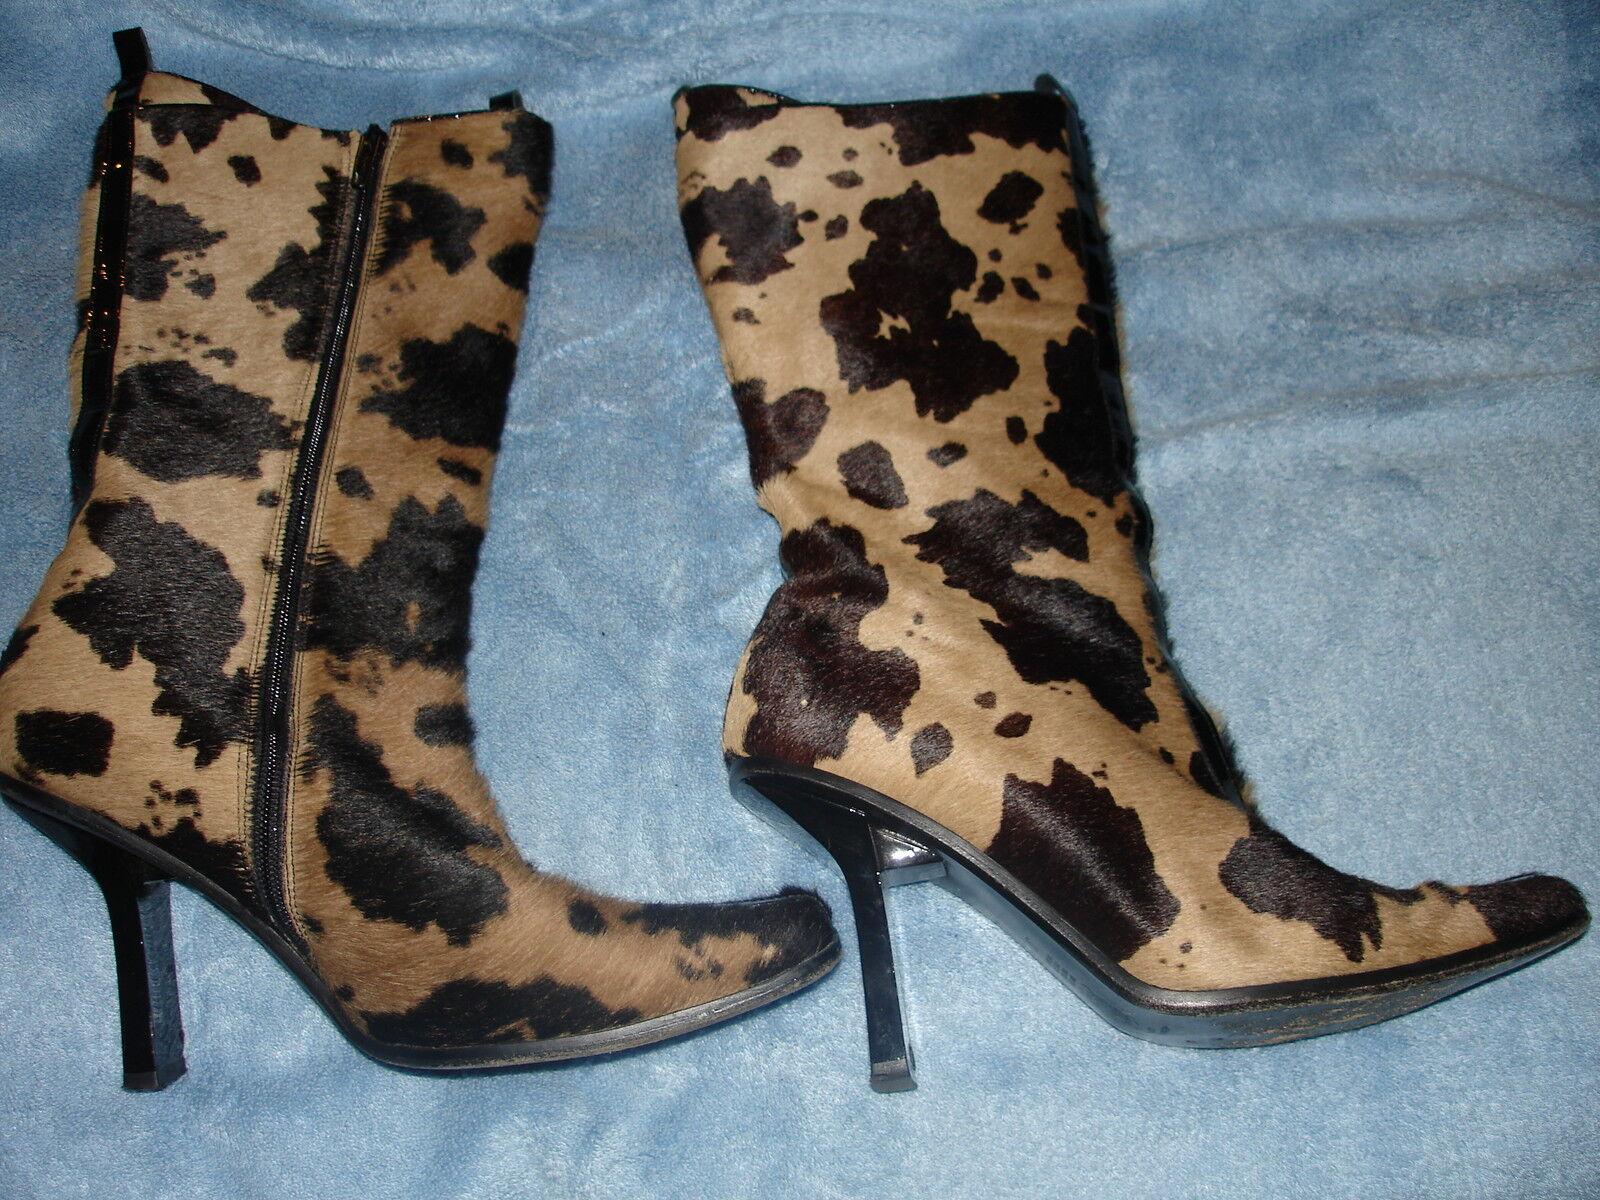 Alluminio Pony Hair Beige and Black Animal Print Boots